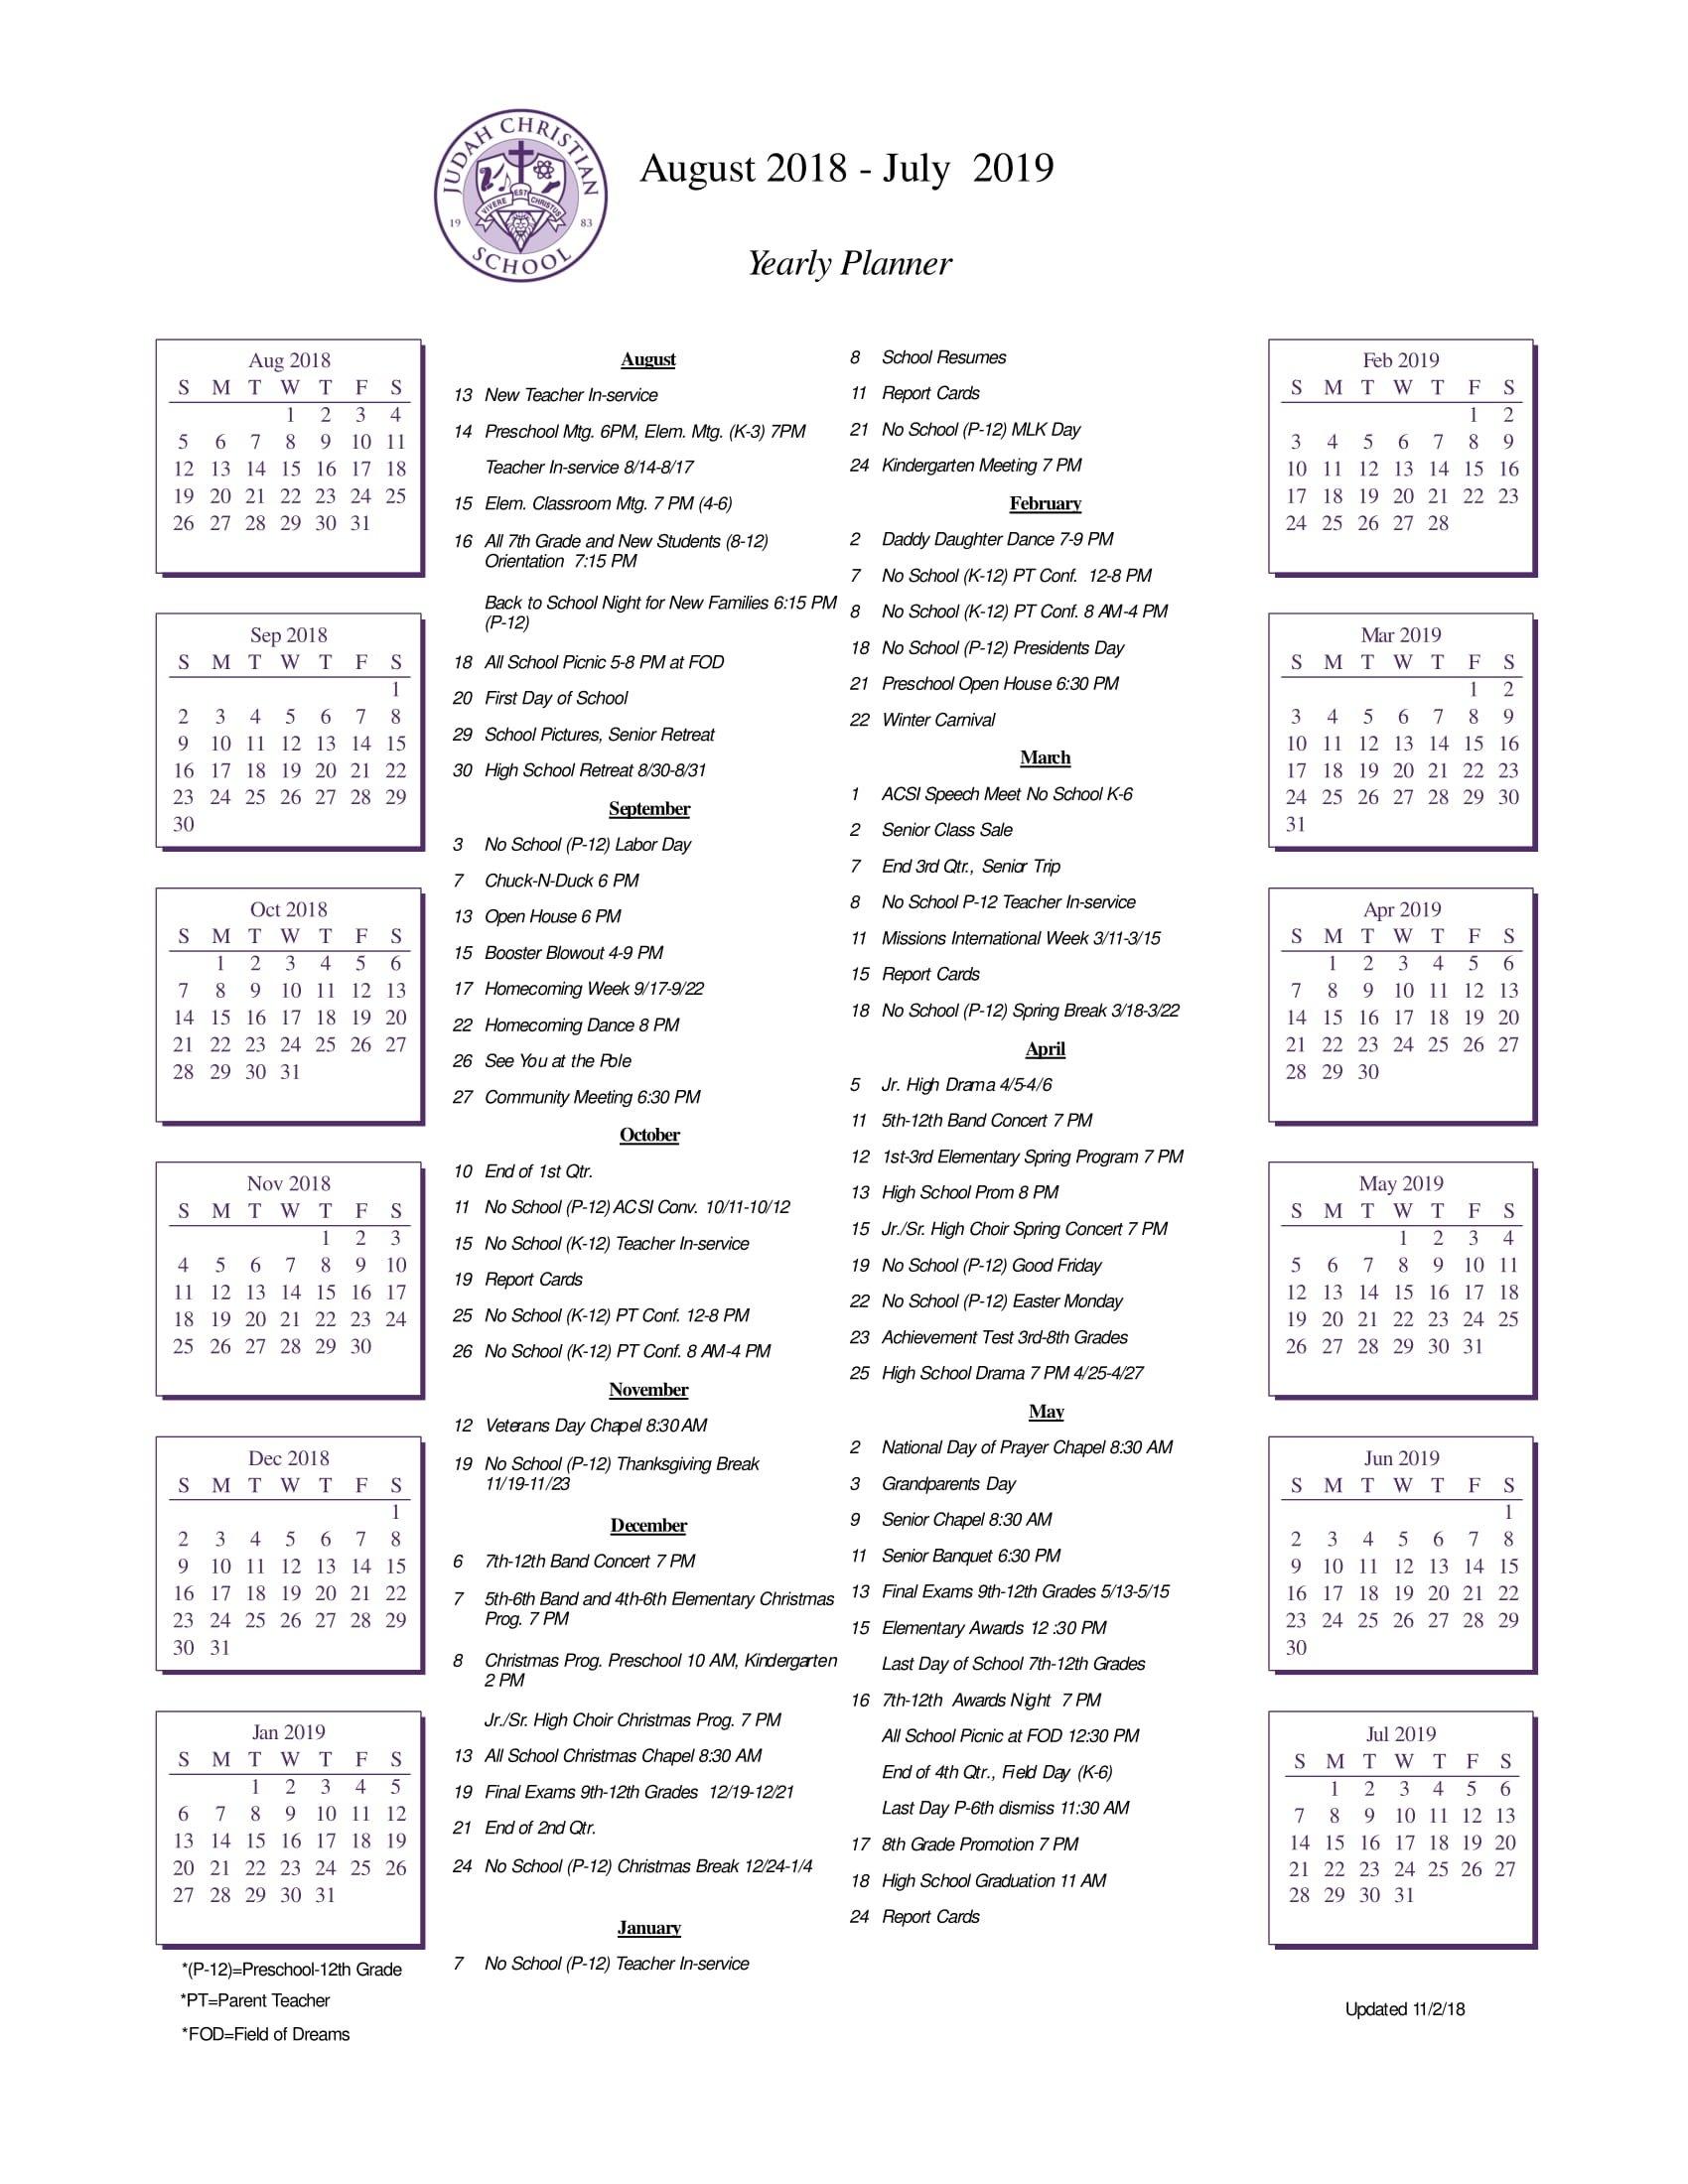 School Calendar - Judah Christian School Calendar 2019 Christian